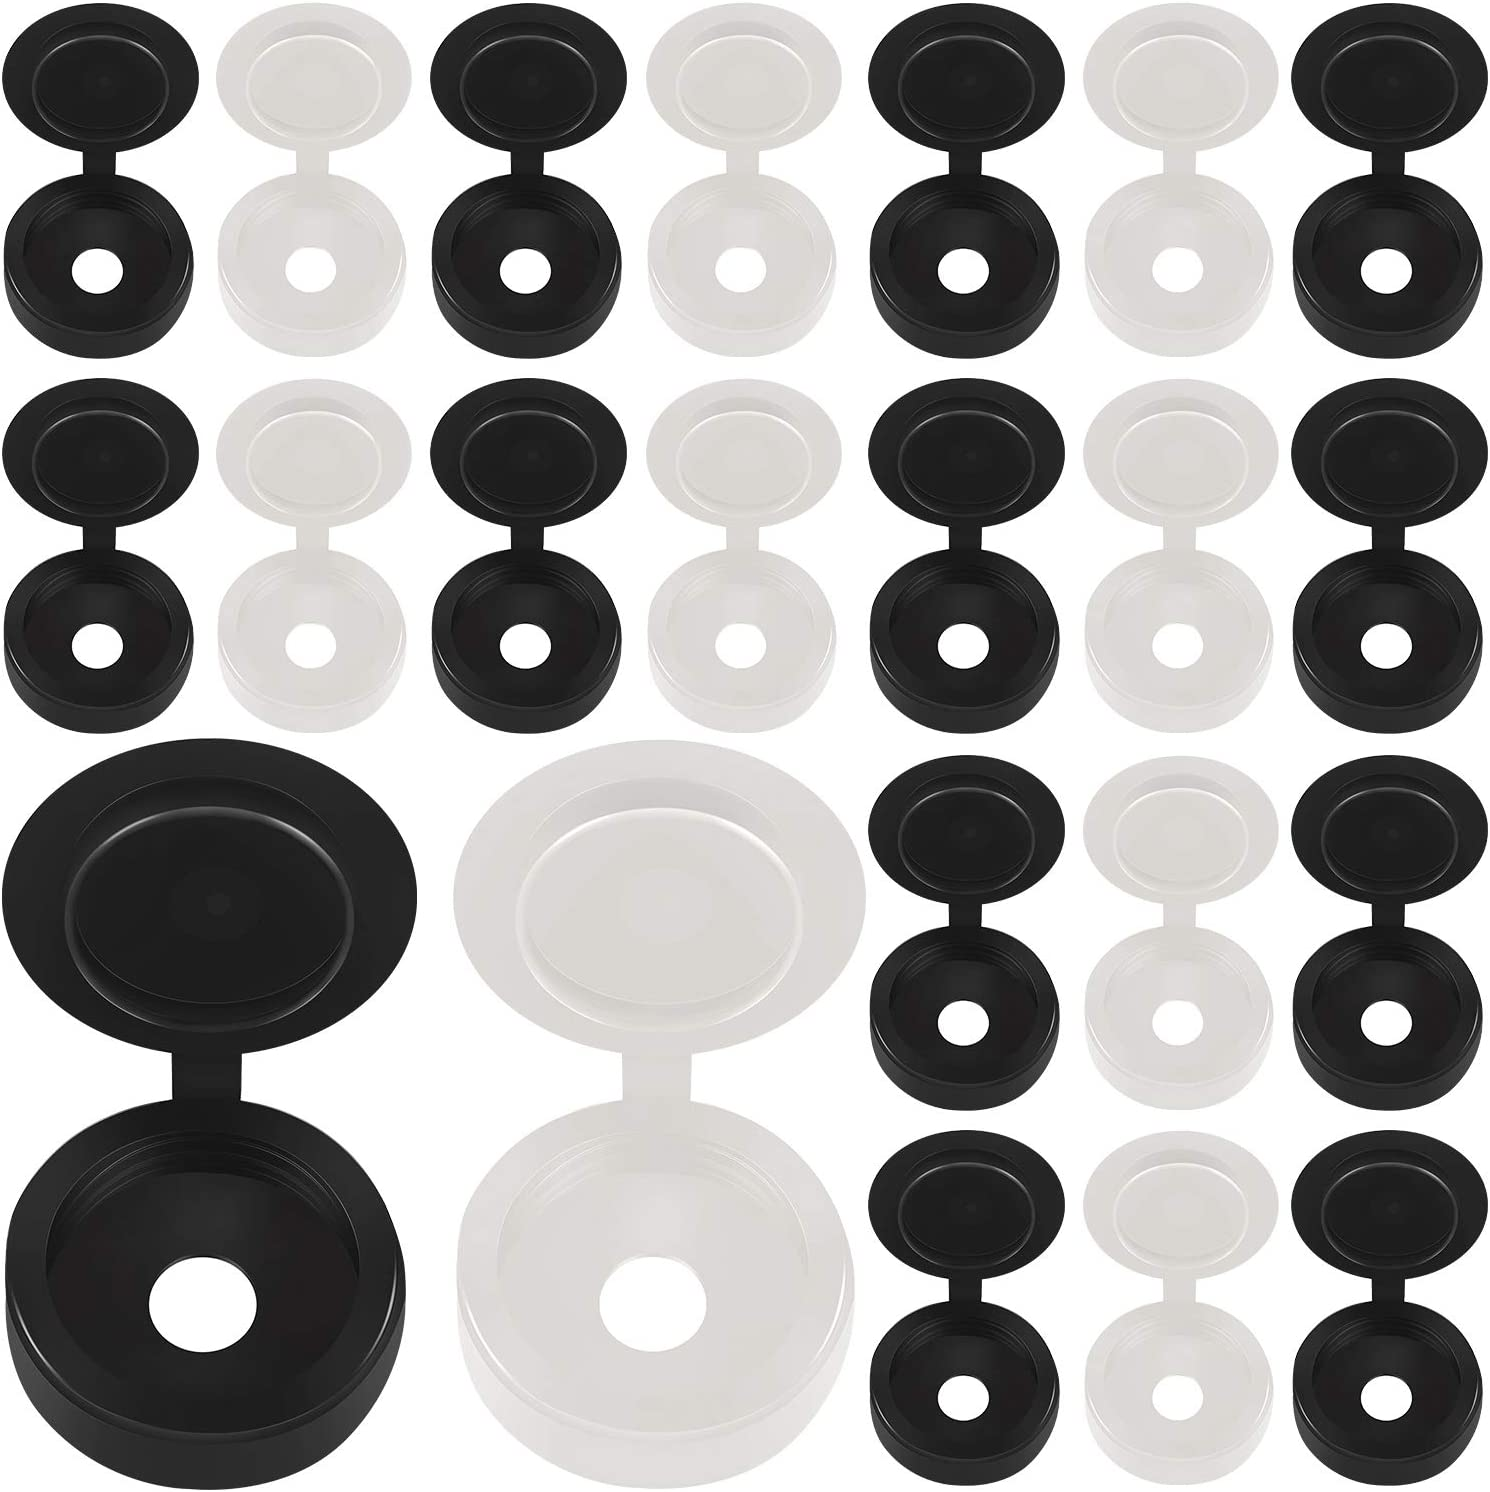 500 Packs Hinged Screw Cover Caps Plastic Screw Caps Fold Screw Snap Covers Washer Flip Tops (Black, White)